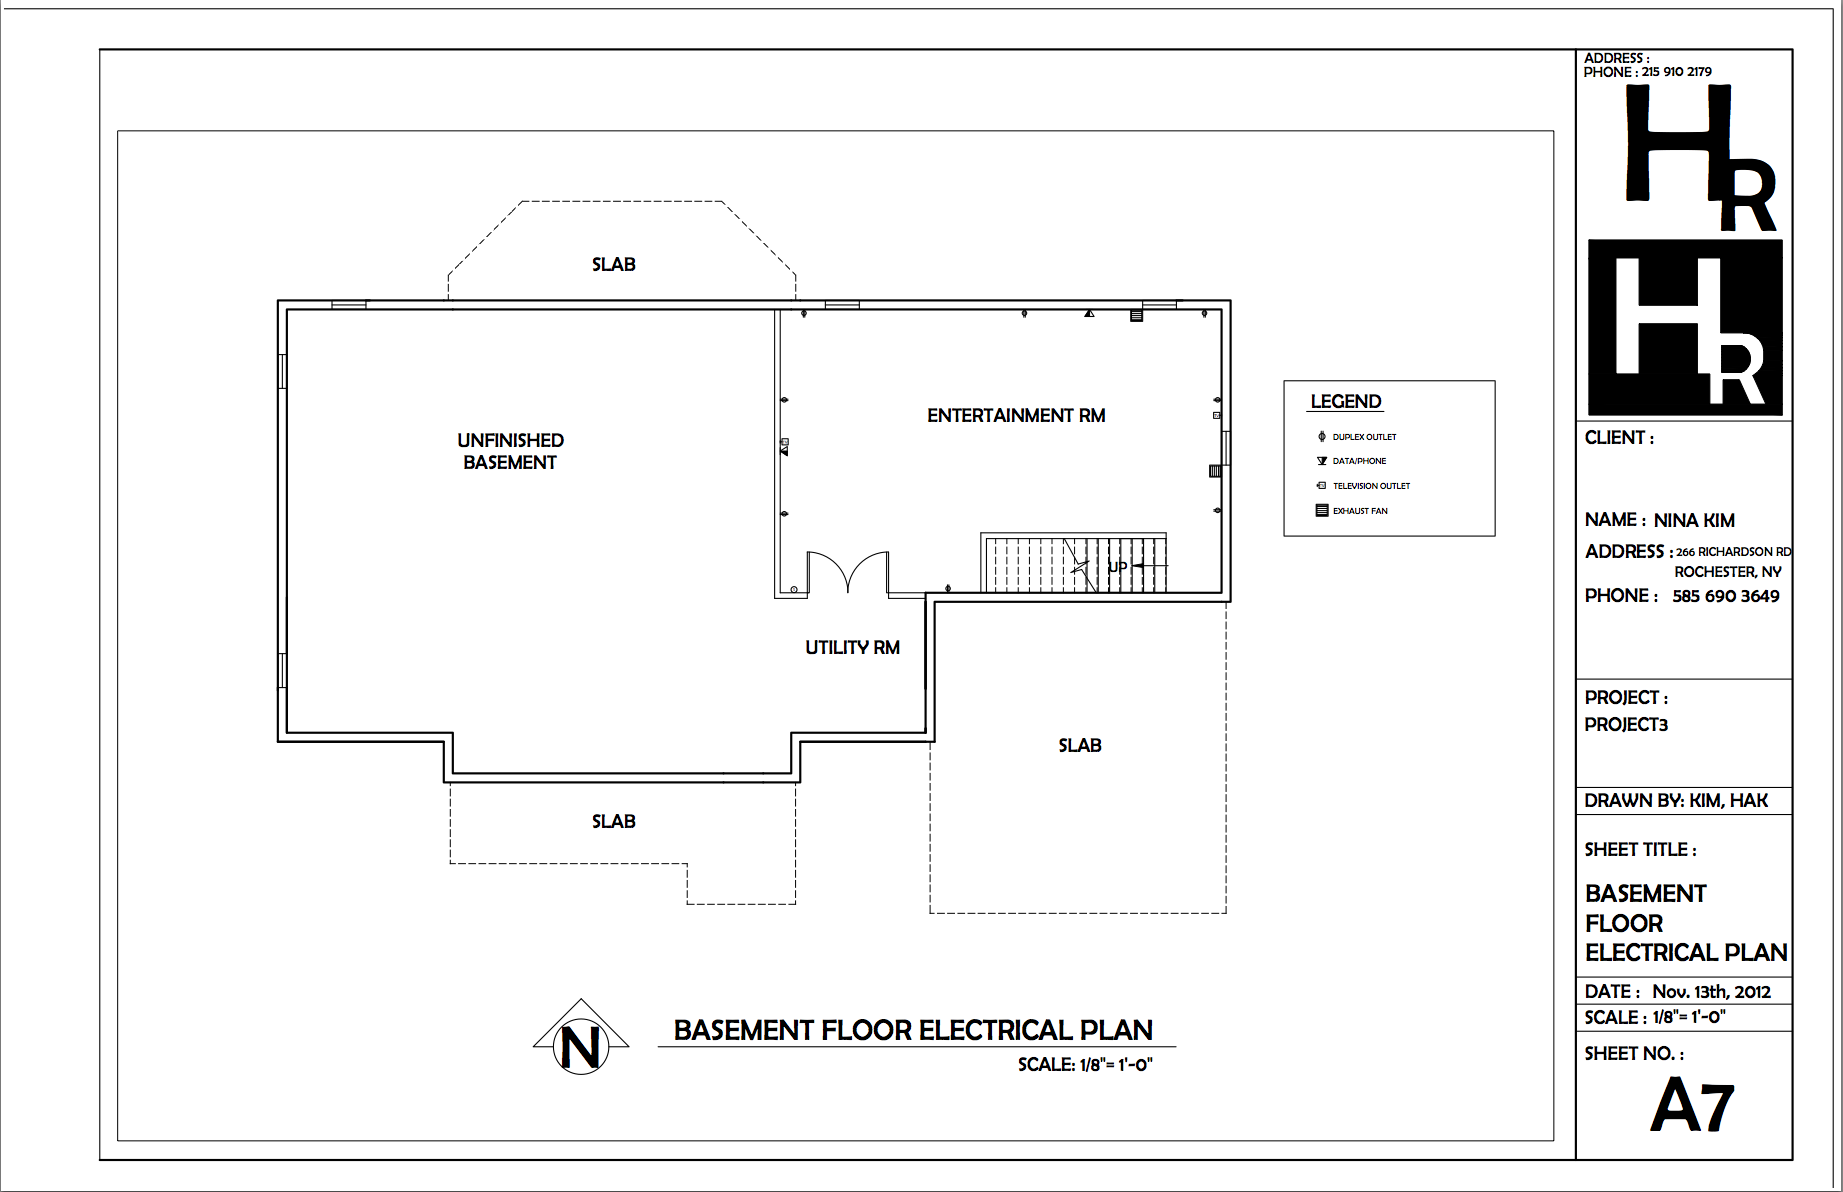 medium resolution of basement floor electrical plan portfolio autocad basement